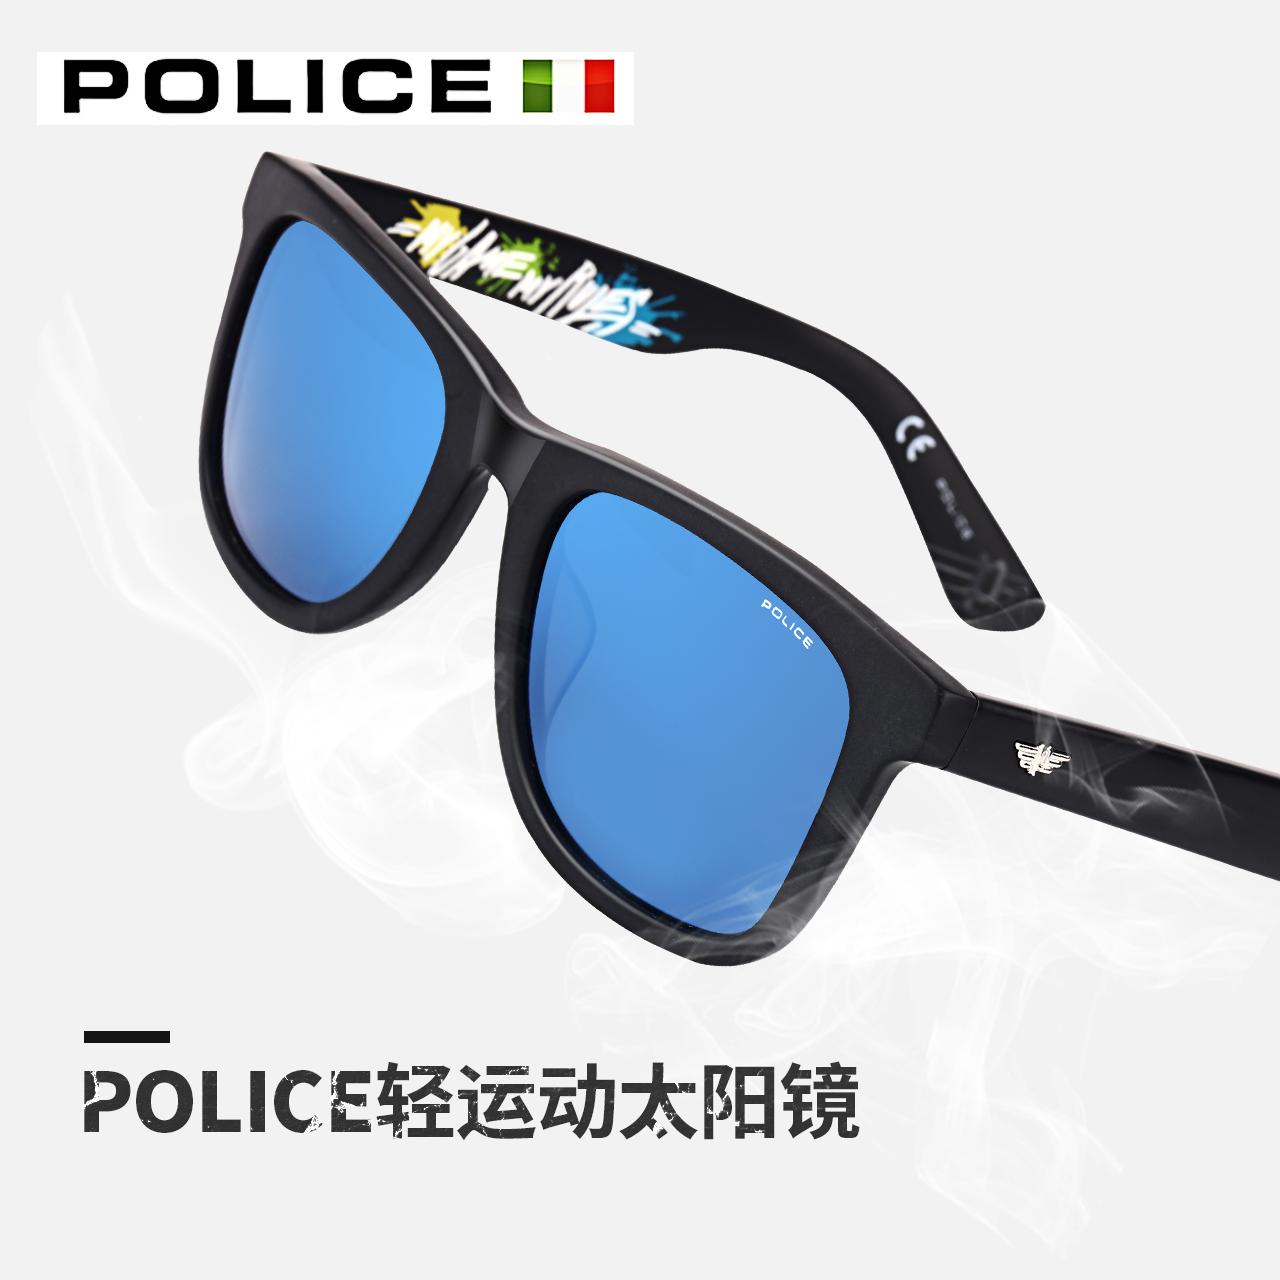 POLICE太阳镜方框经典款男潮偏光墨镜女防紫外线司机眼镜SPL371K